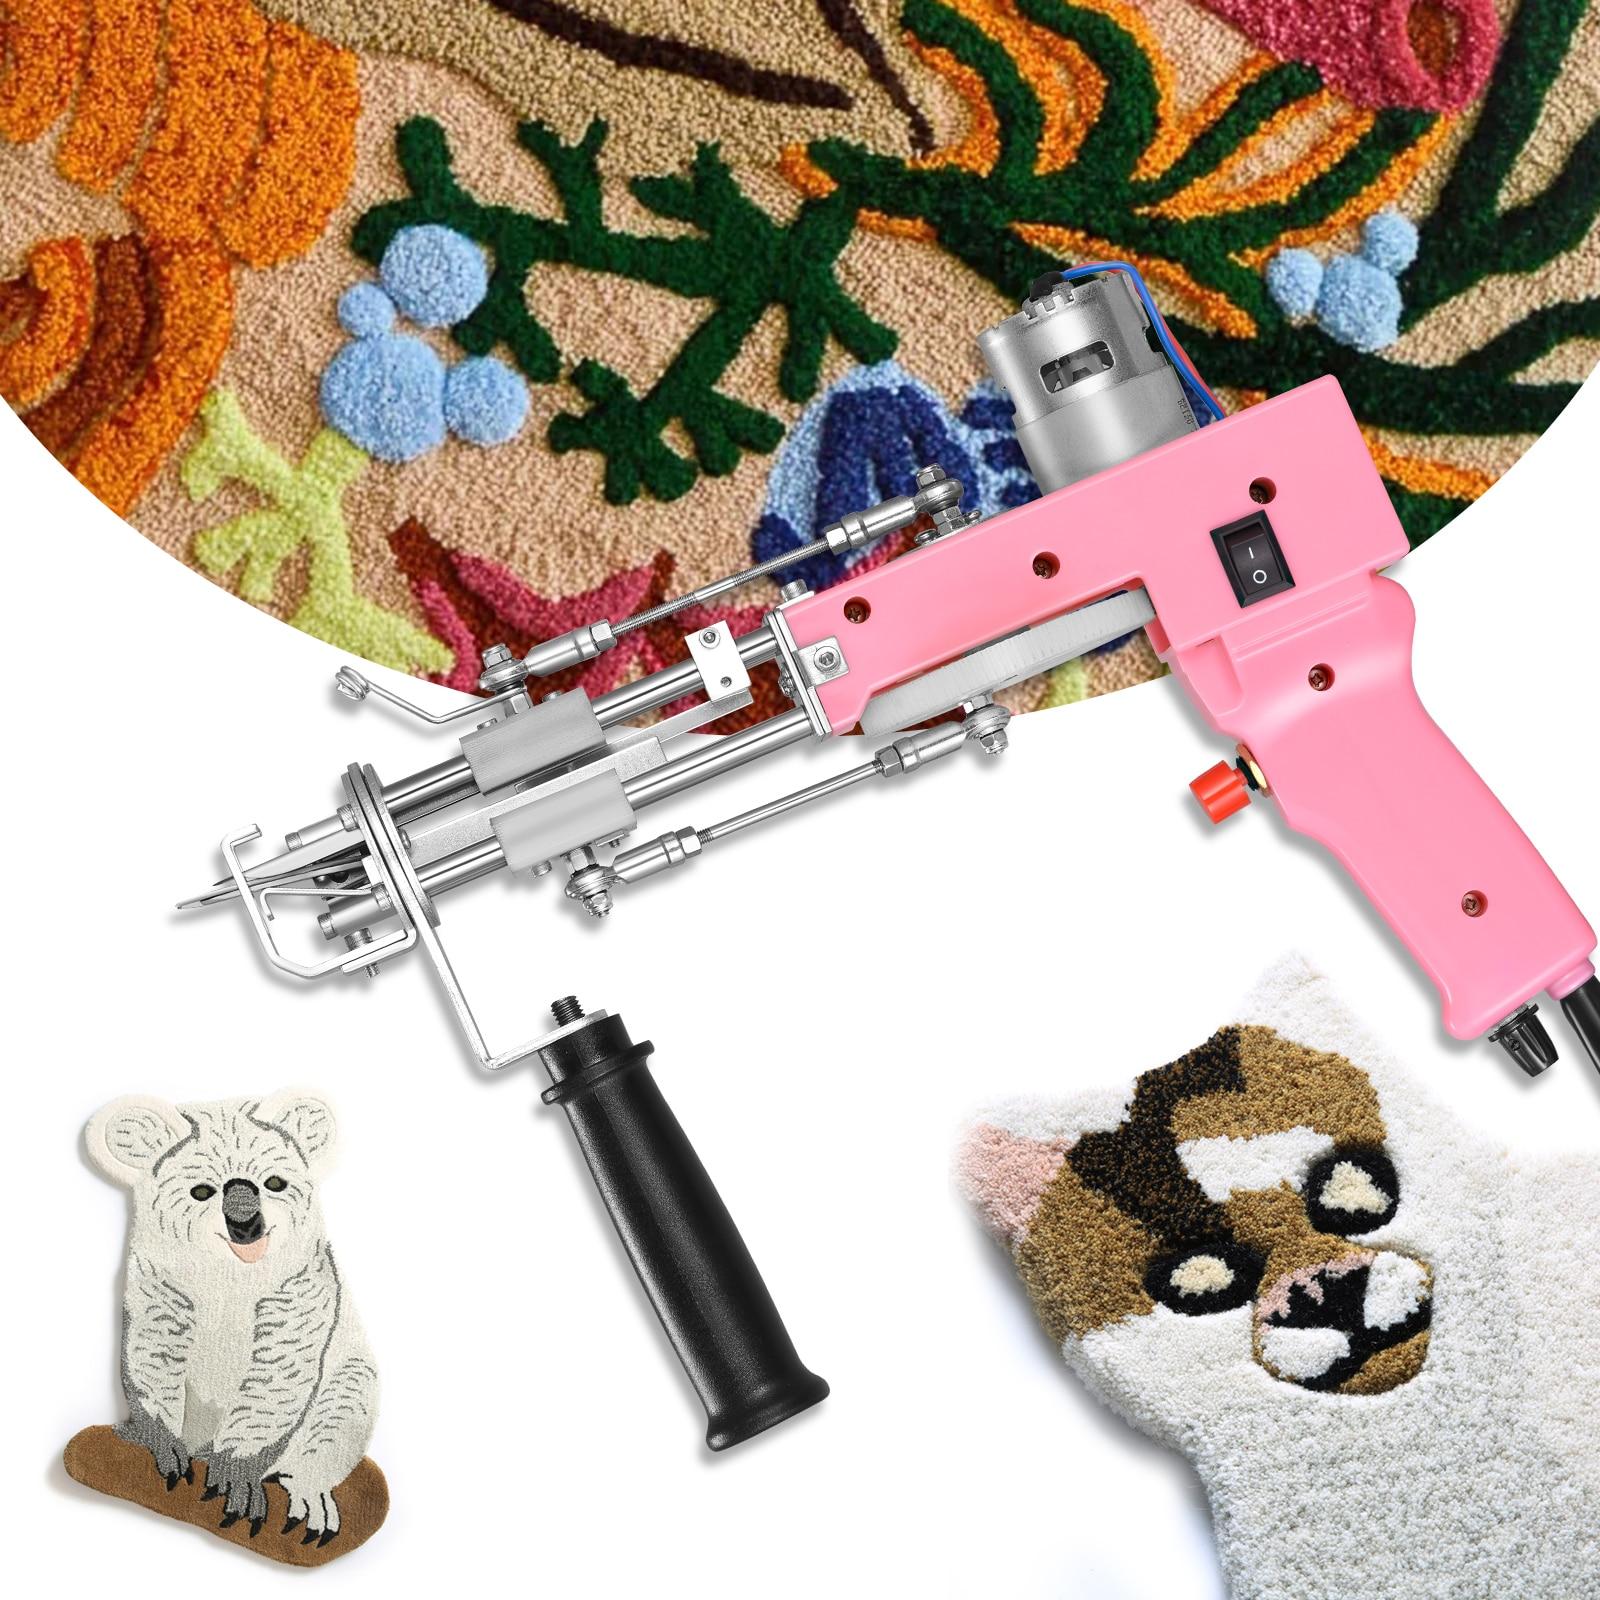 110-220V Tufting Gun Can do both Cut Pile and Loop Pile Carpet Weaving Electric Hand Rug Tufting Machines Rug Making Tools enlarge